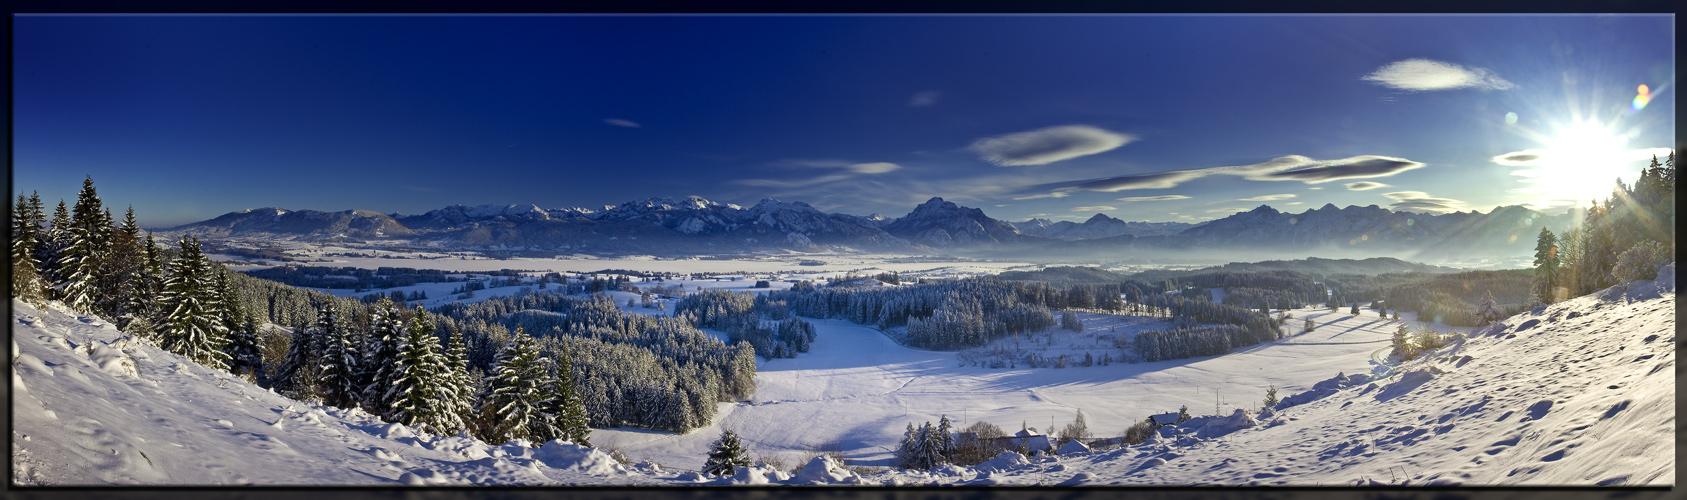 Winter im Allgäu - III